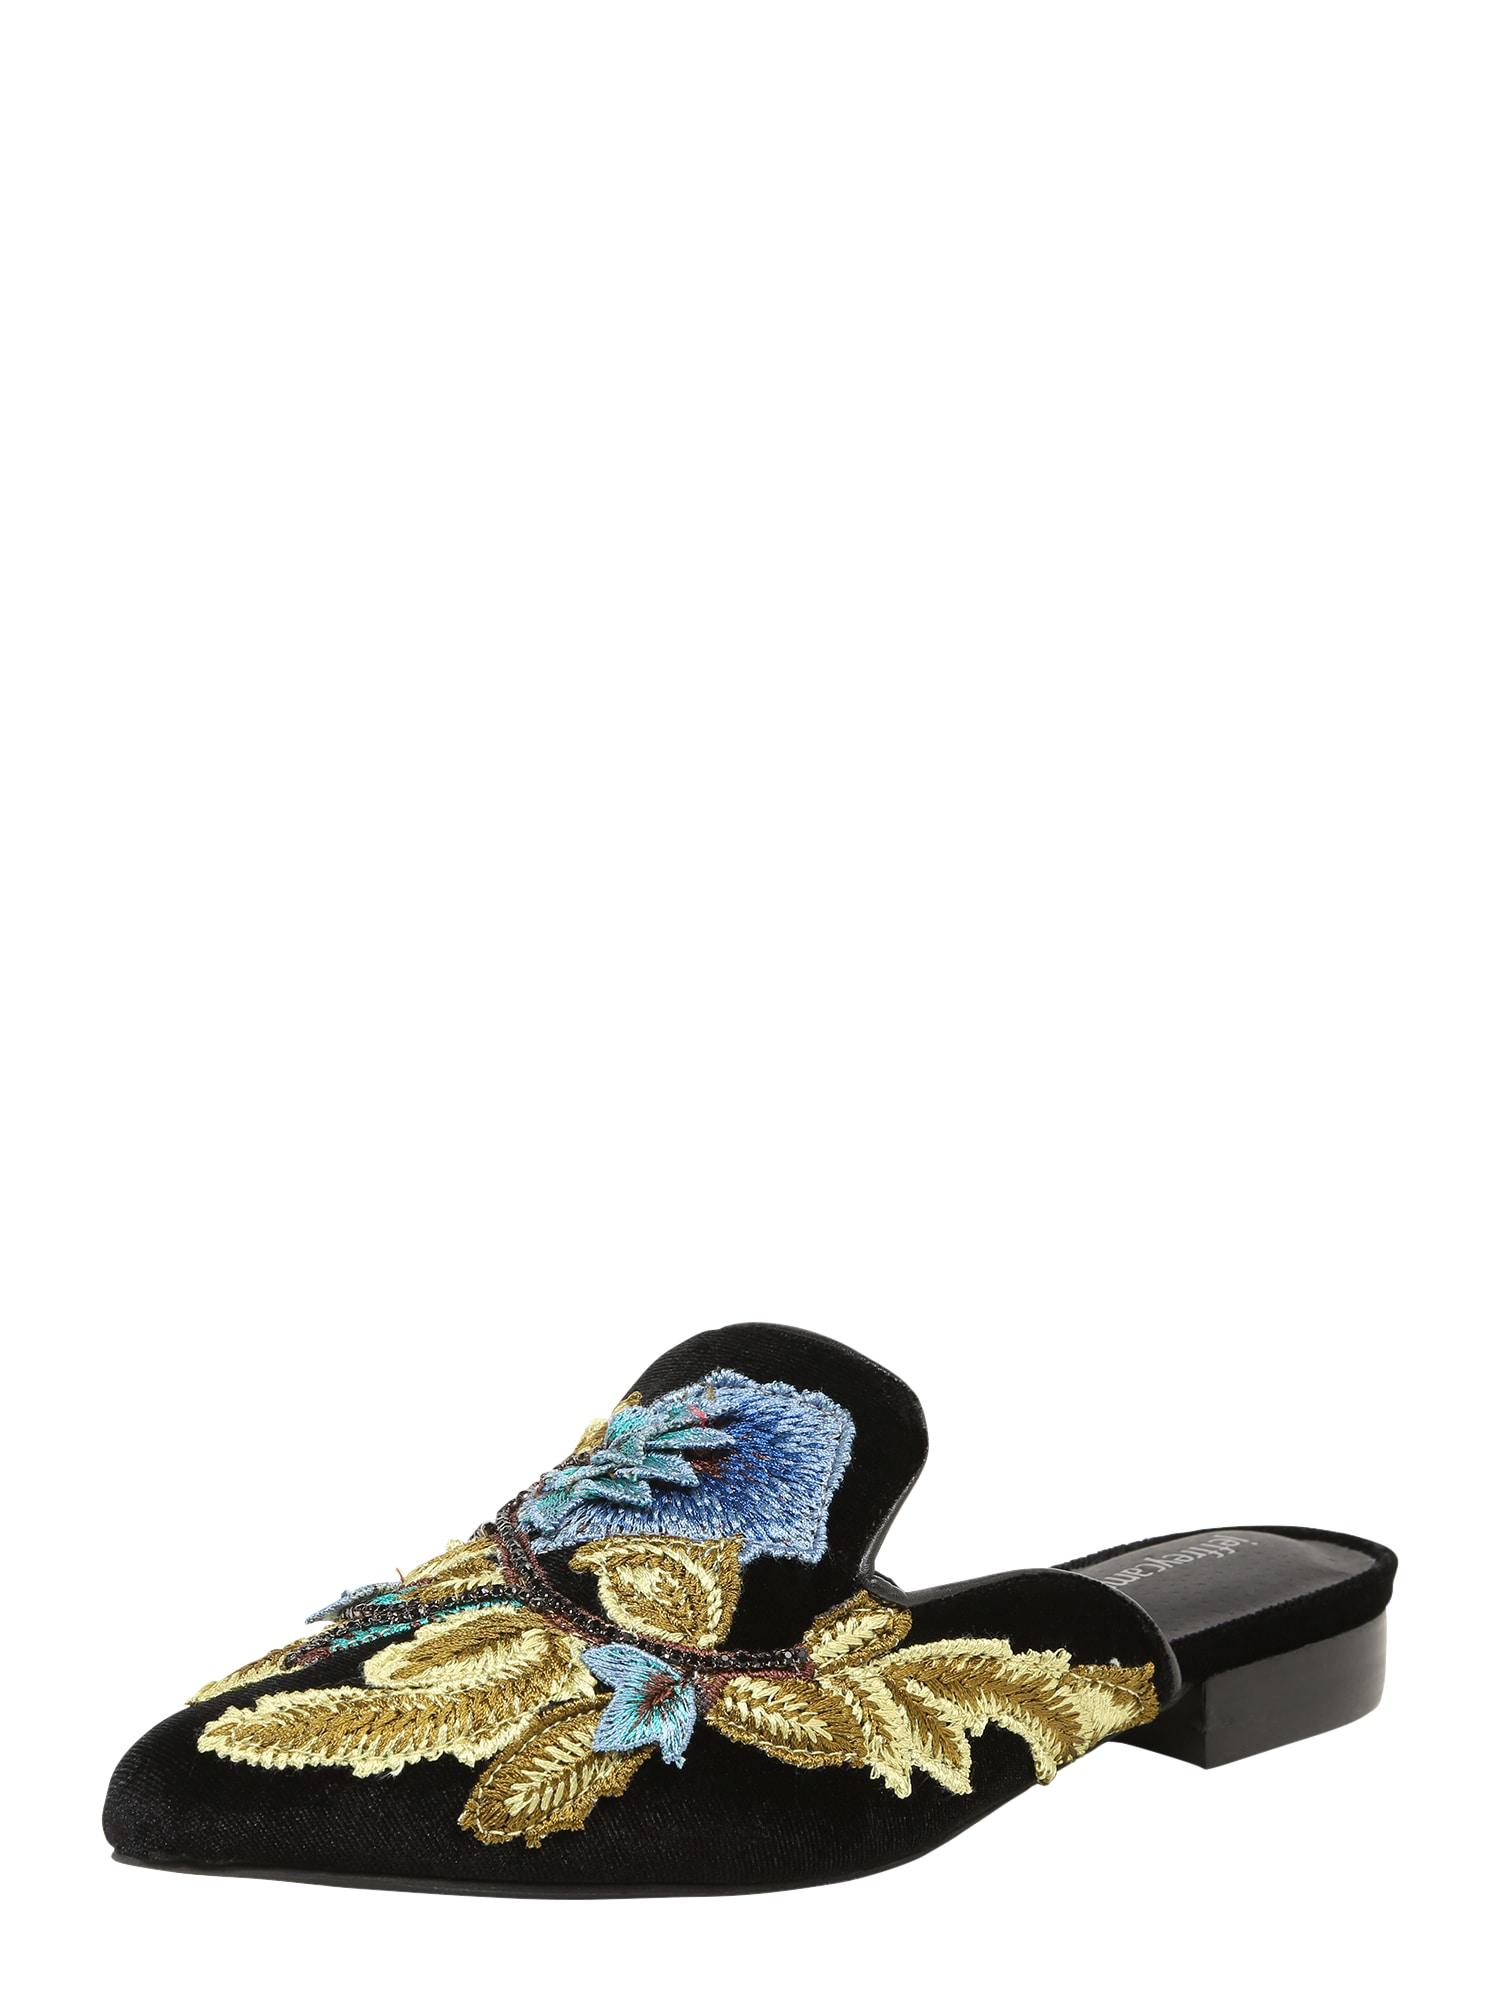 Pantofle CLAES černá Jeffrey Campbell